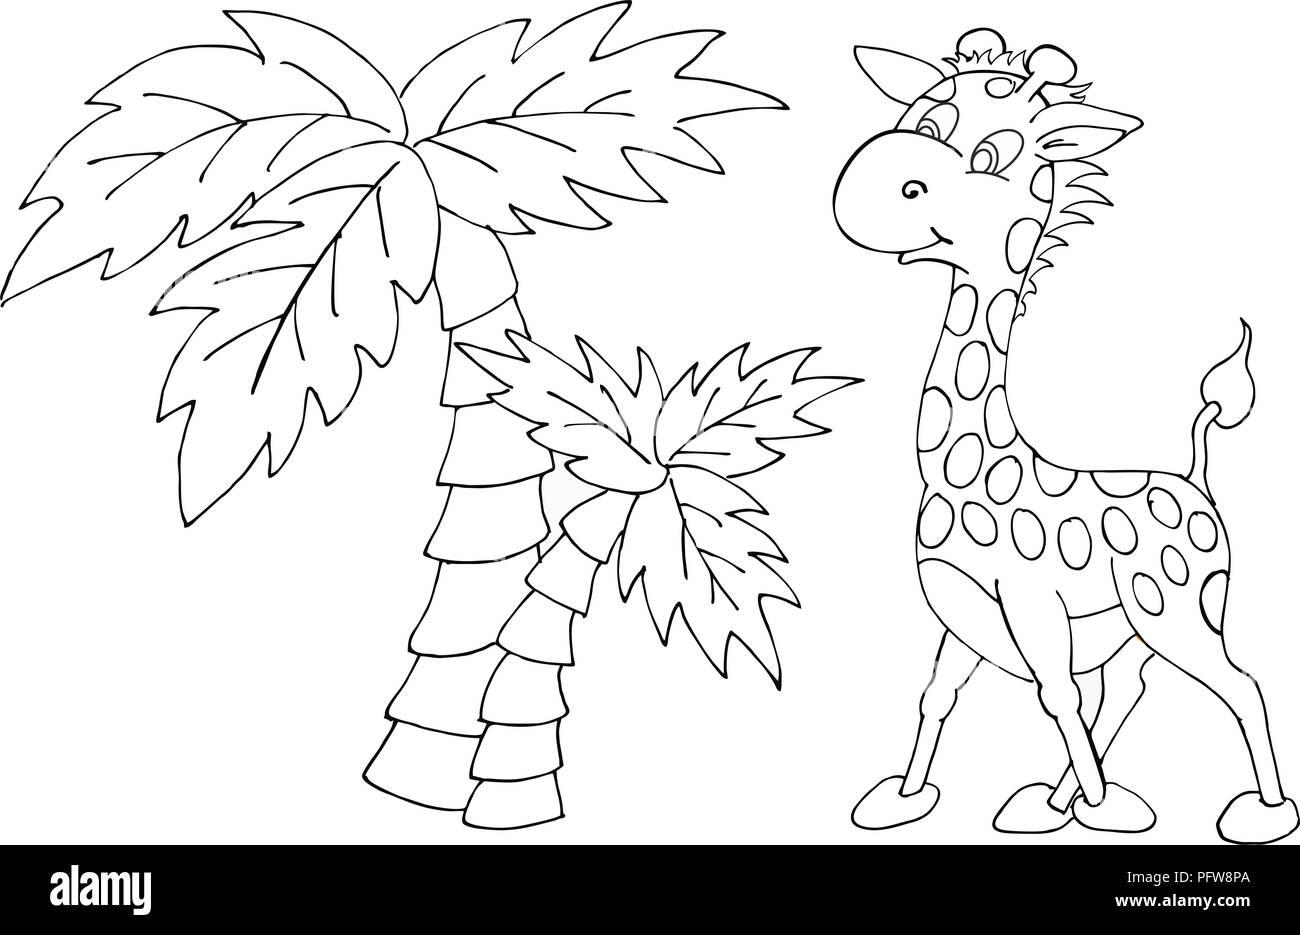 Vector Illustration Wild Animals Cartoons Black And White Stock